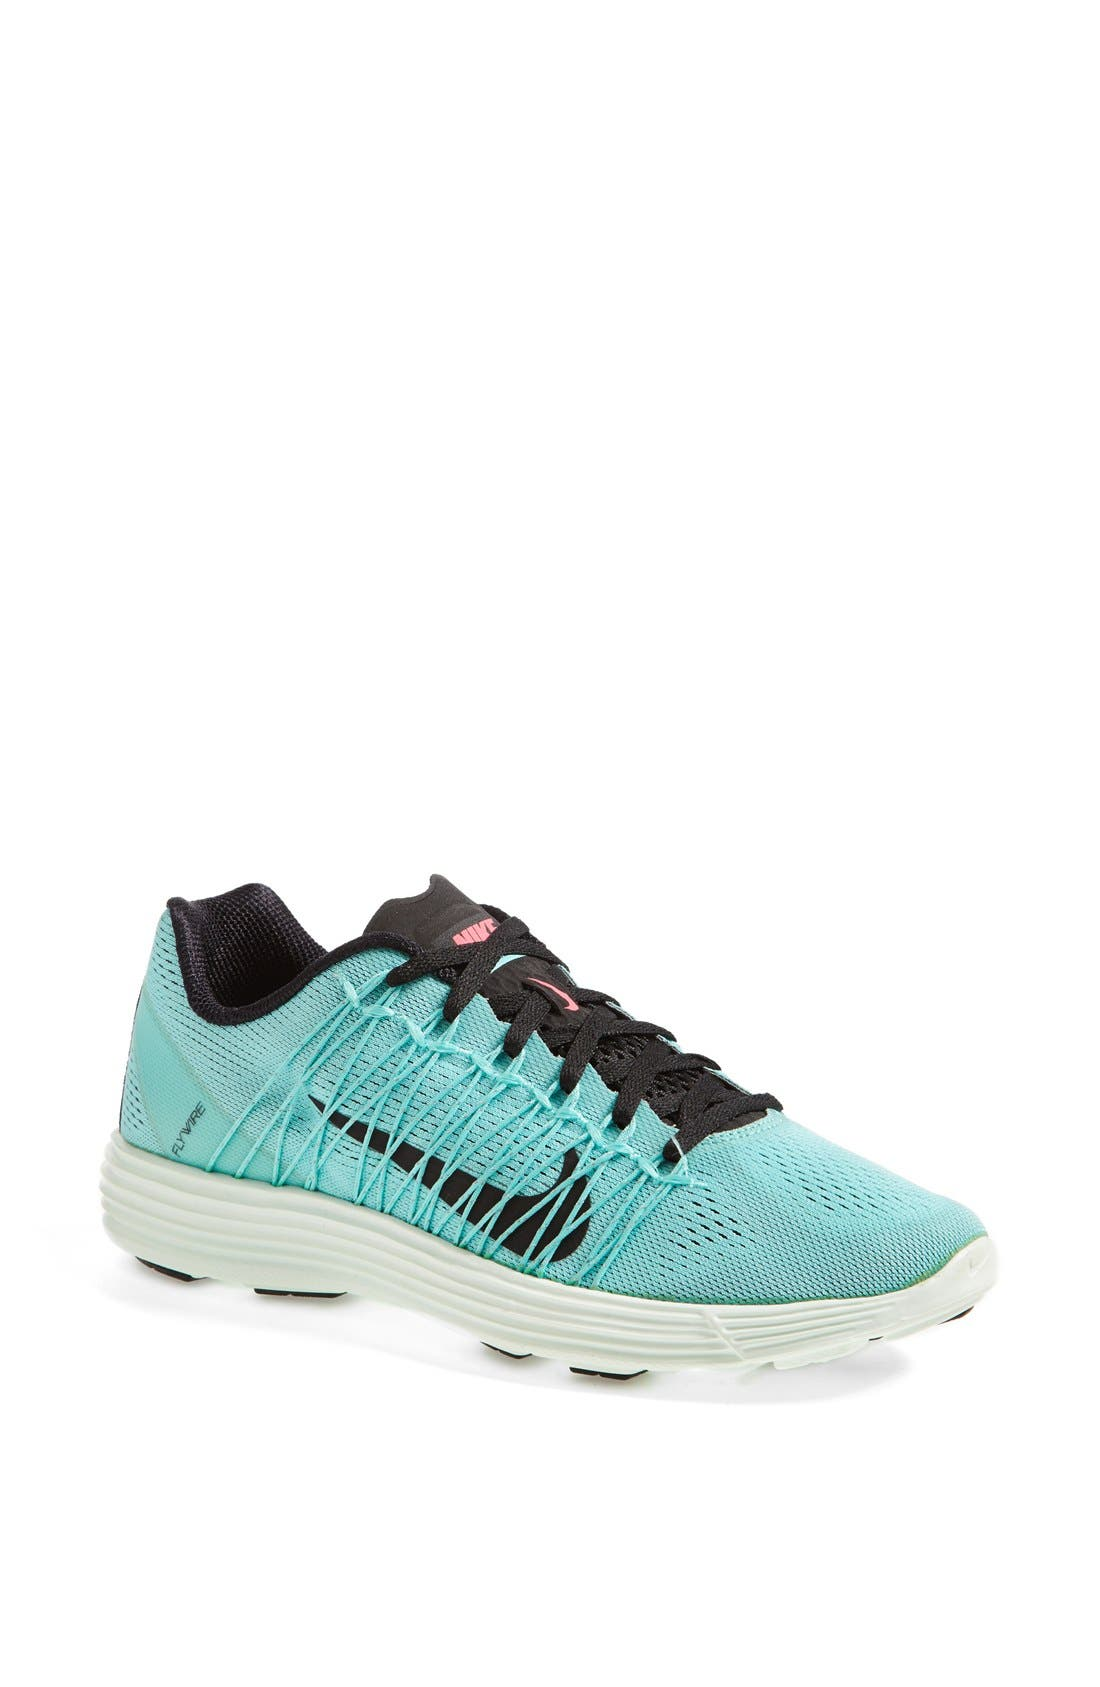 'Lunaracer+ 3' Running Shoe,                         Main,                         color, Hyper Turquoise